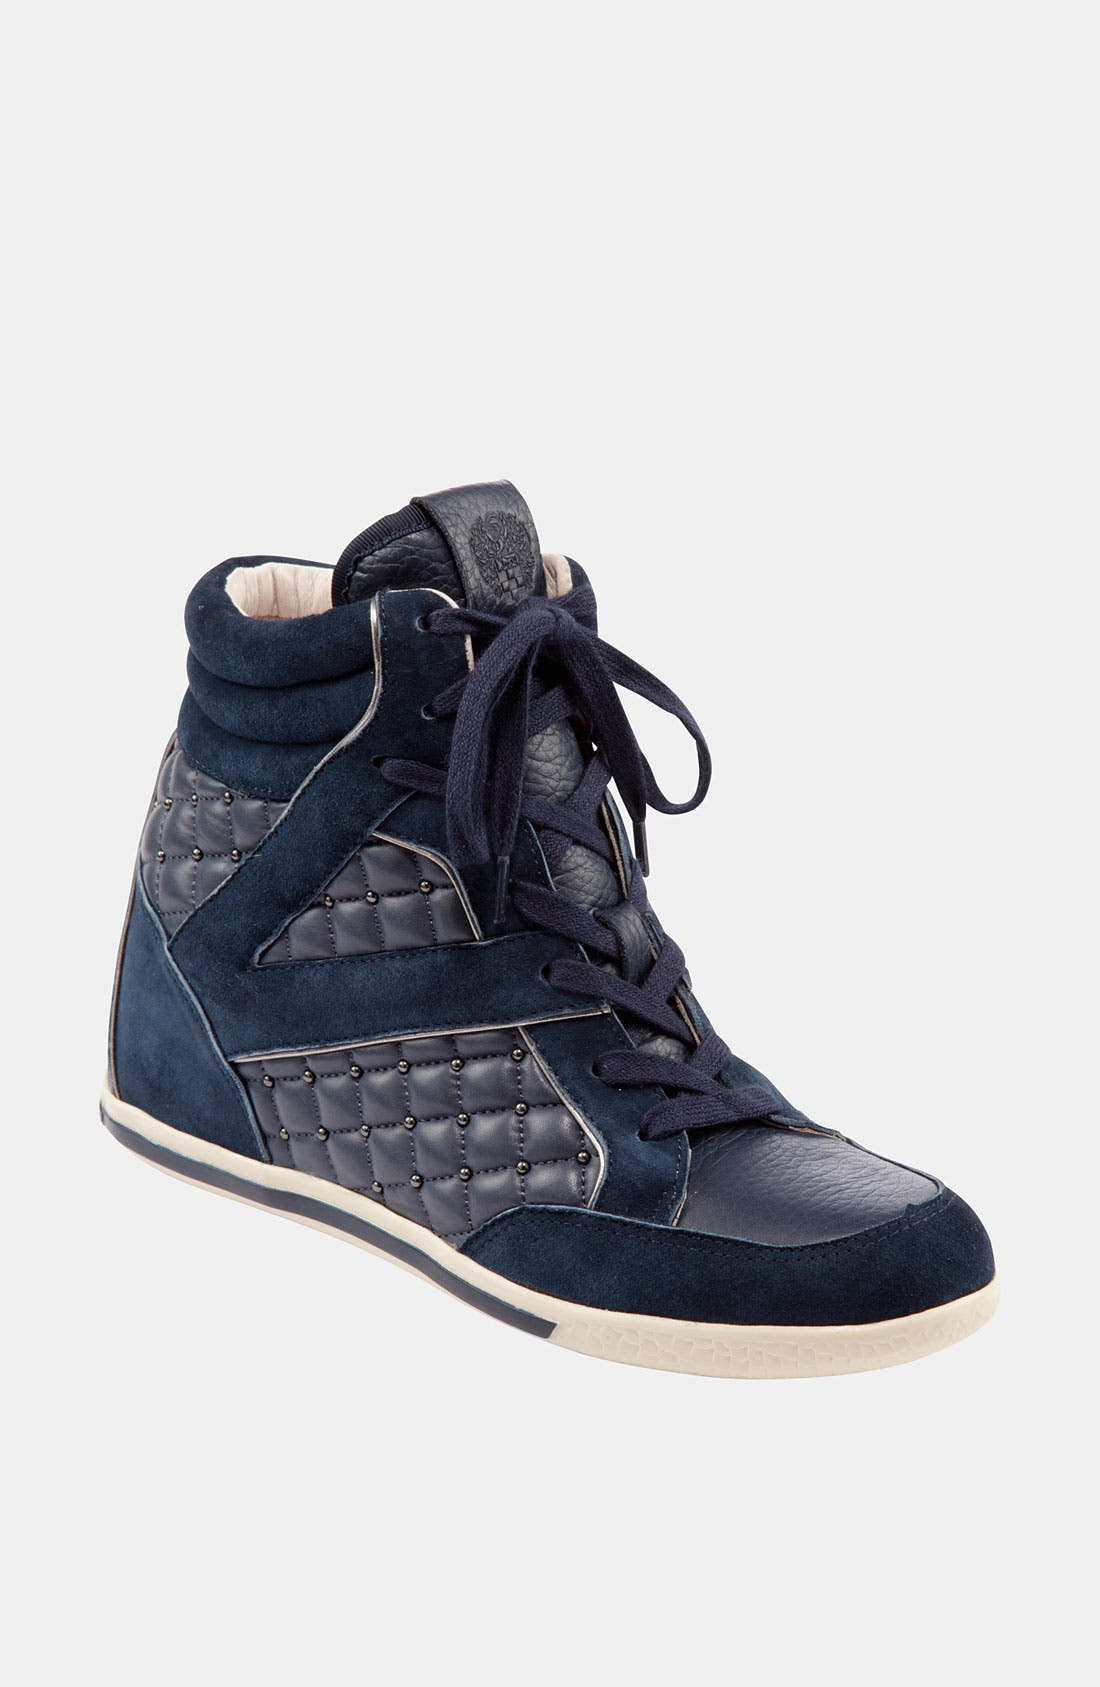 Main Image - Vince Camuto 'Follie' Sneaker